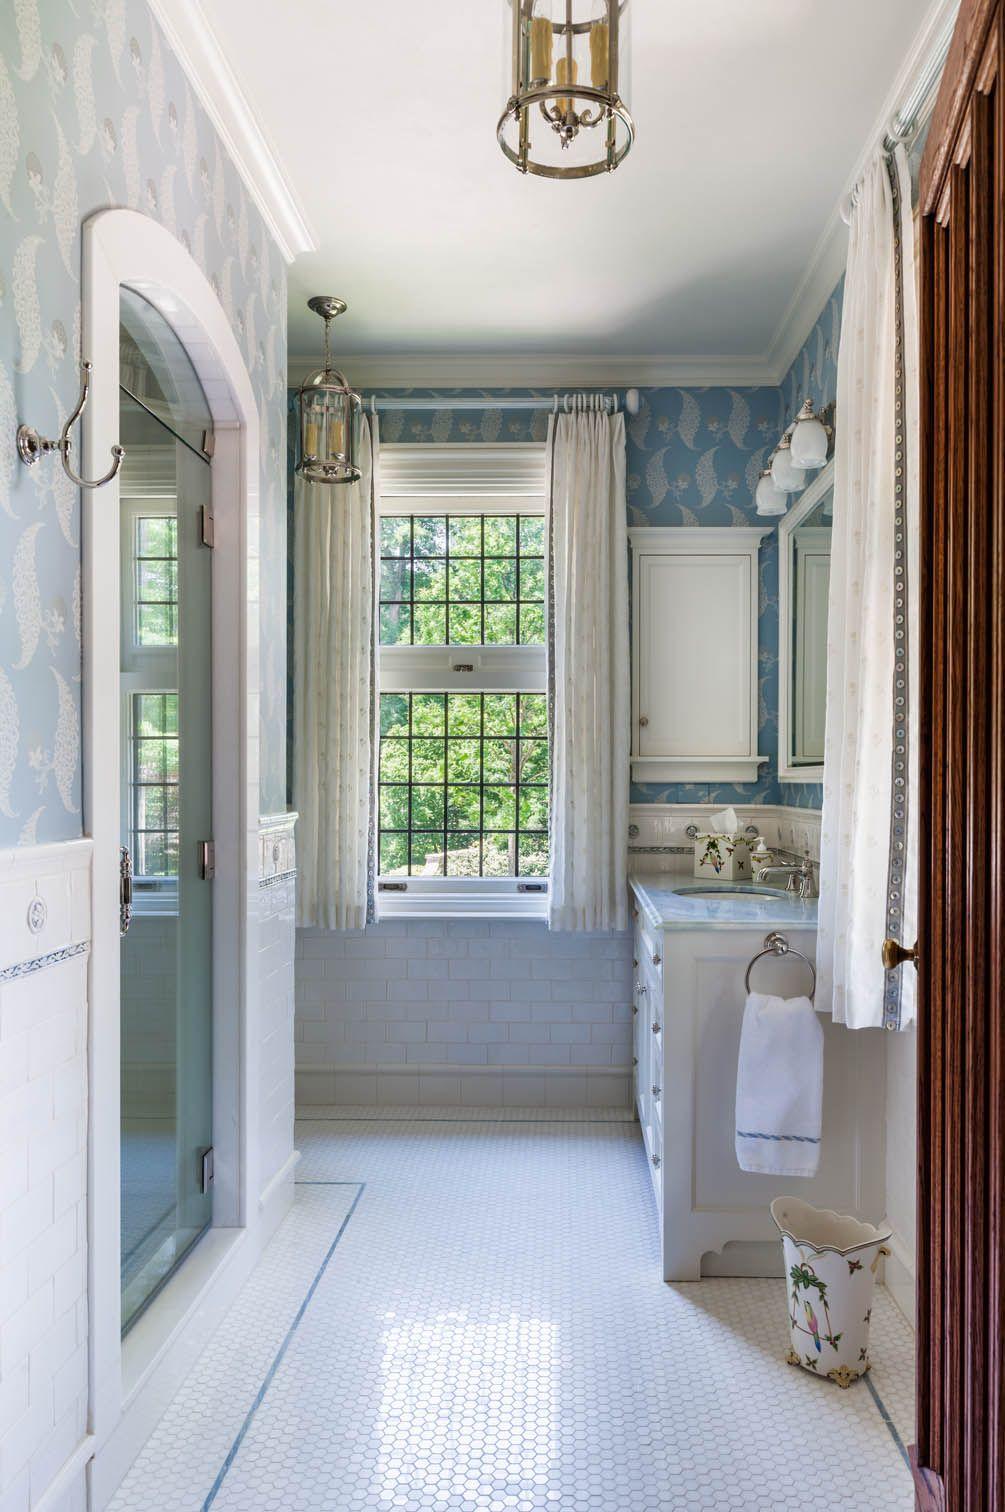 Simple Elegant And Bright A Perfect Guest Bath Dressing Room Design Guest Bath Beautiful Bathrooms